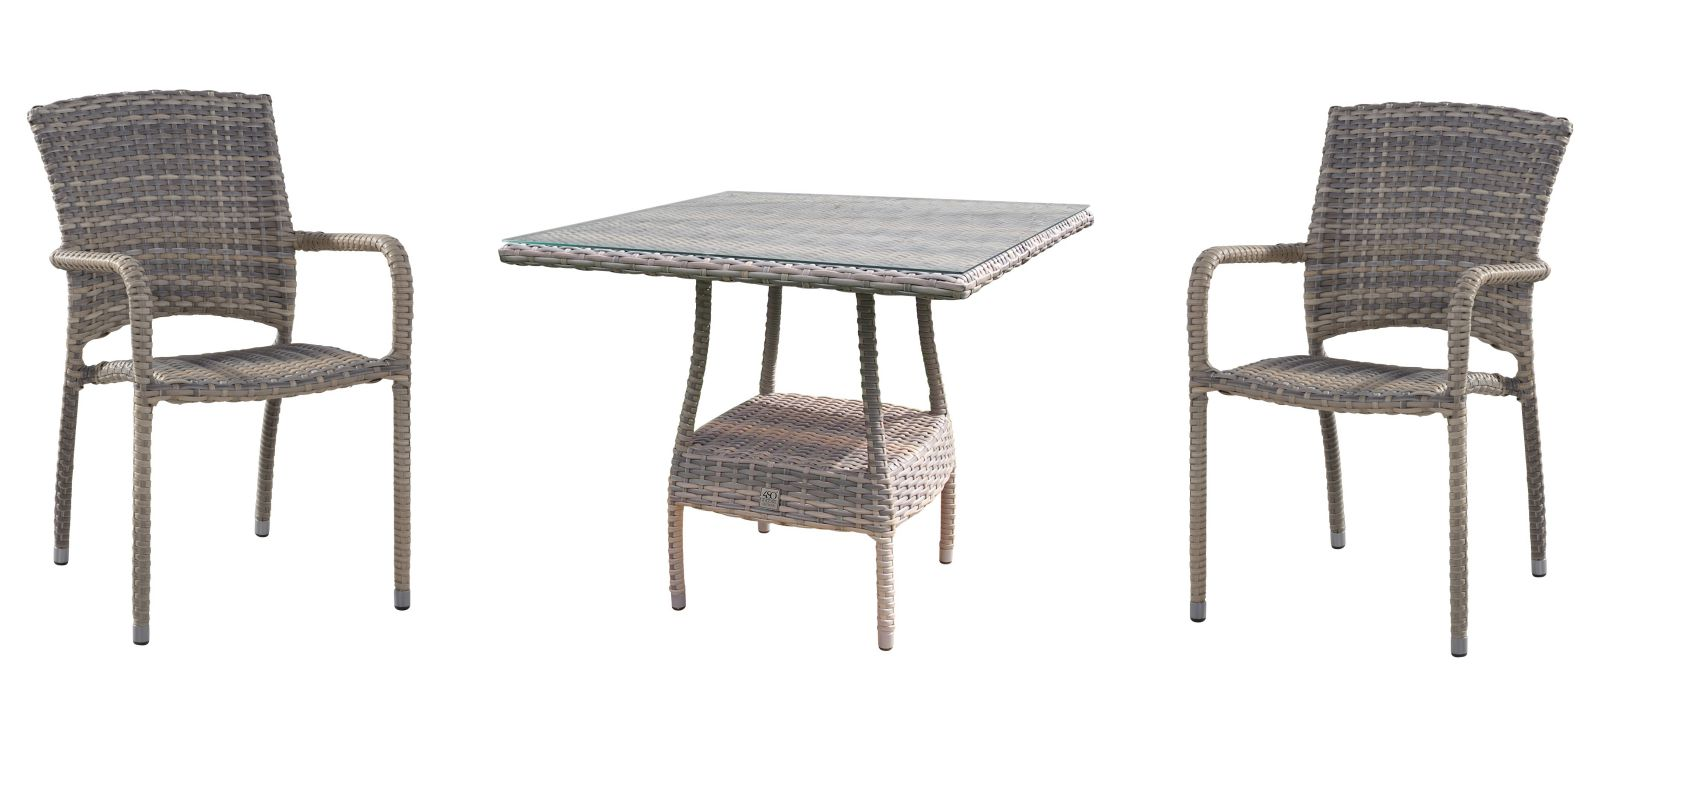 4 seasons outdoor wales devon dining set sale latour. Black Bedroom Furniture Sets. Home Design Ideas